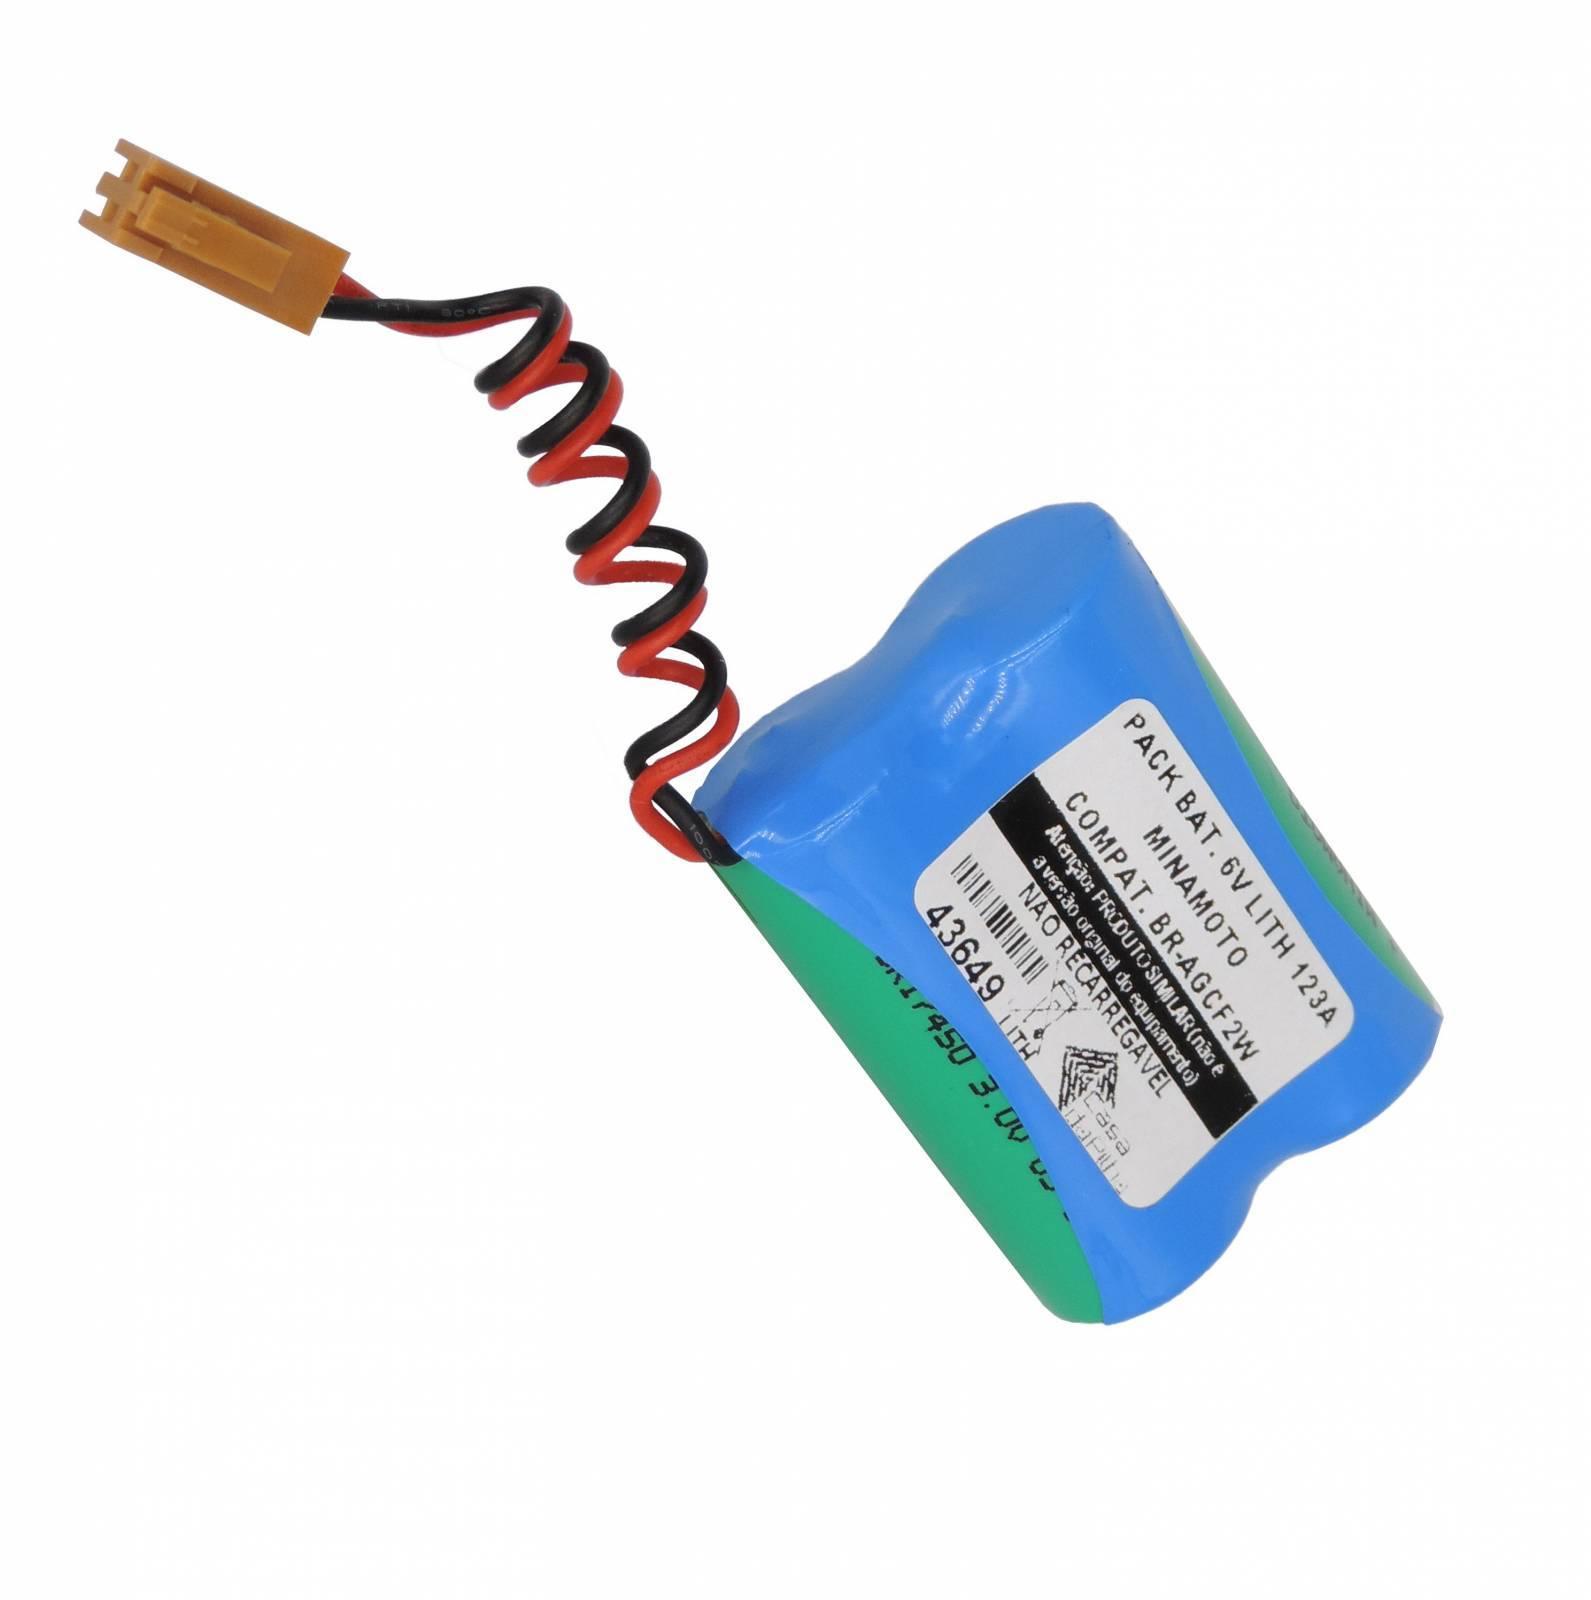 Bateria PACK 6V LITH PLC Fanuc (Simil. BR-AGCF2W) MINAMOTO - Casa da Pilha